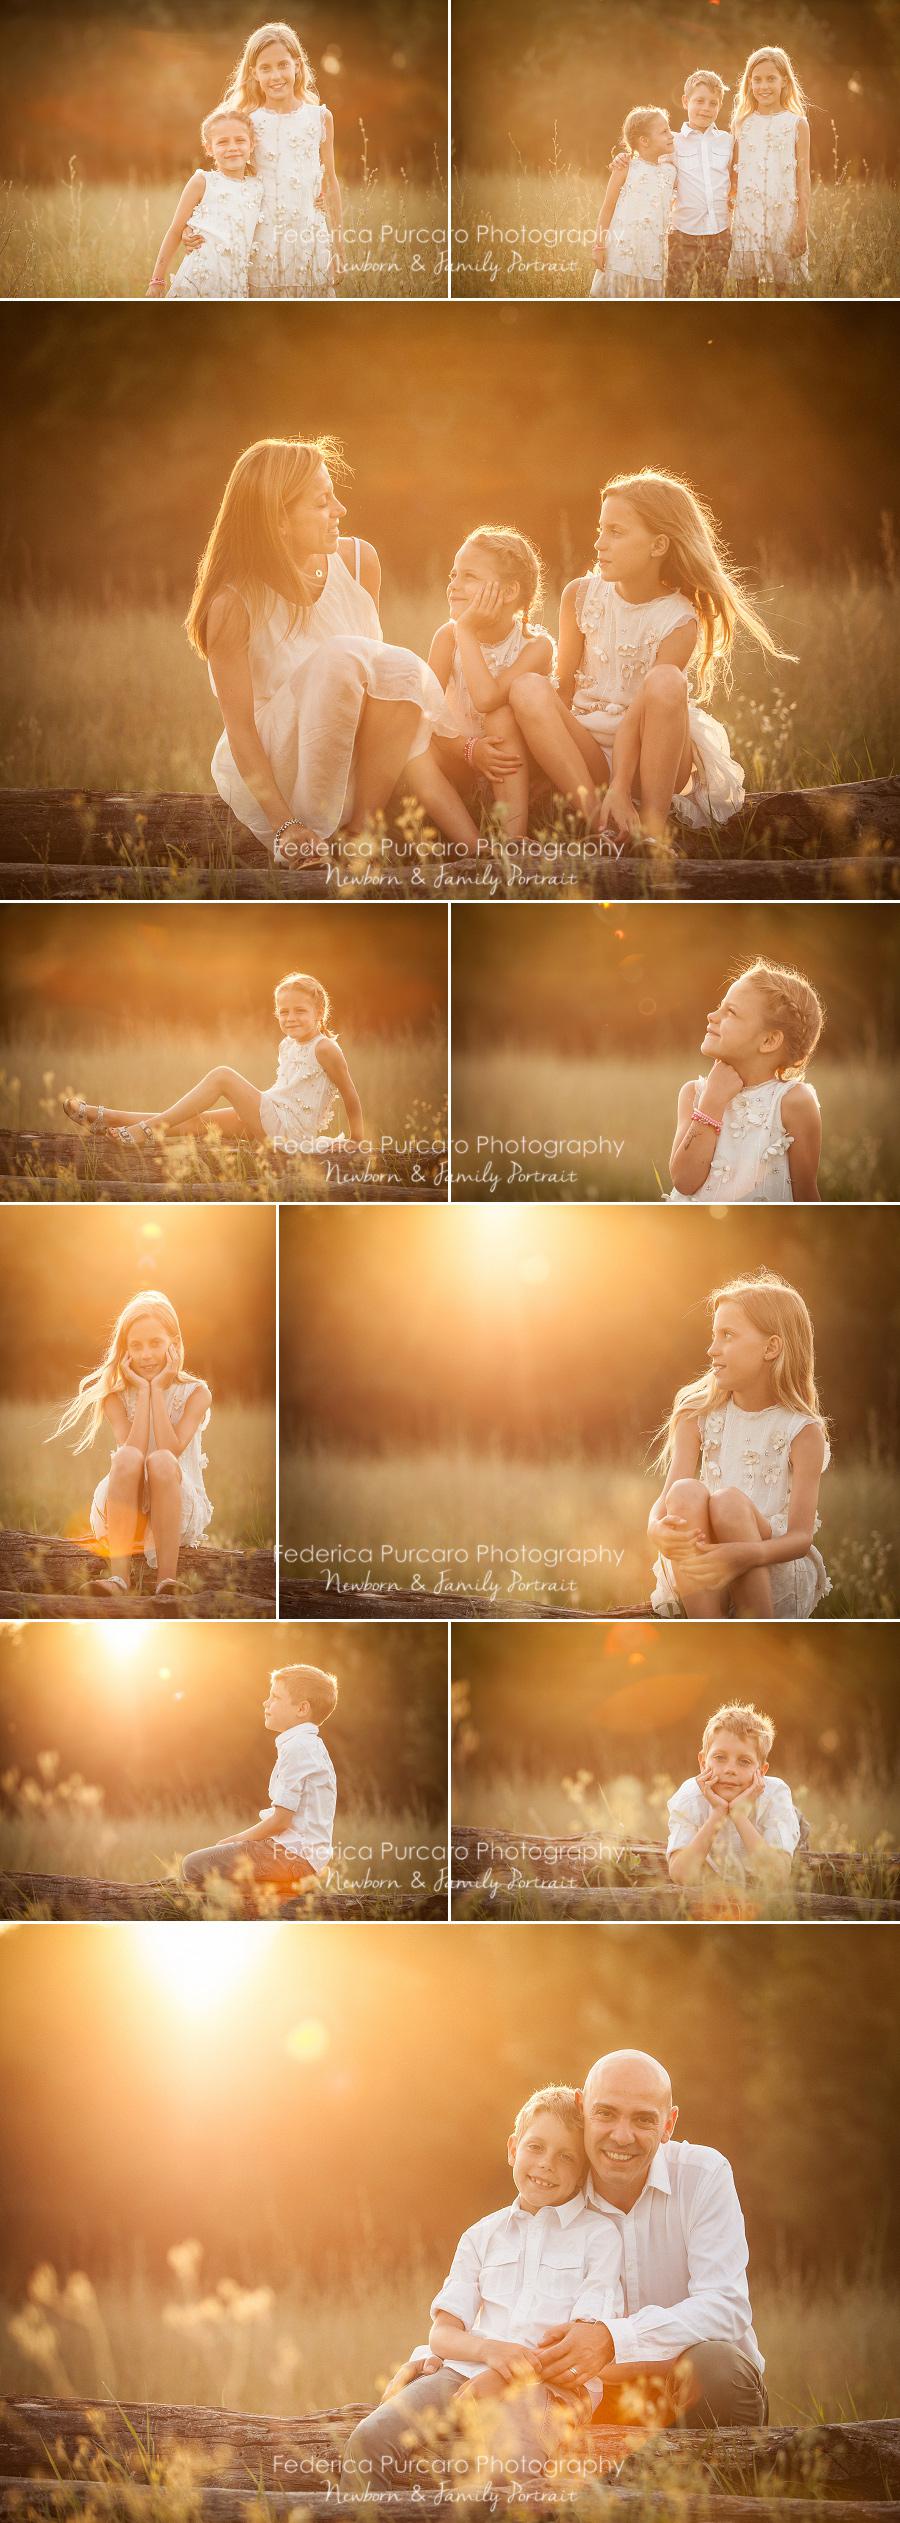 federica purcaro - fotografo bambini modena 3